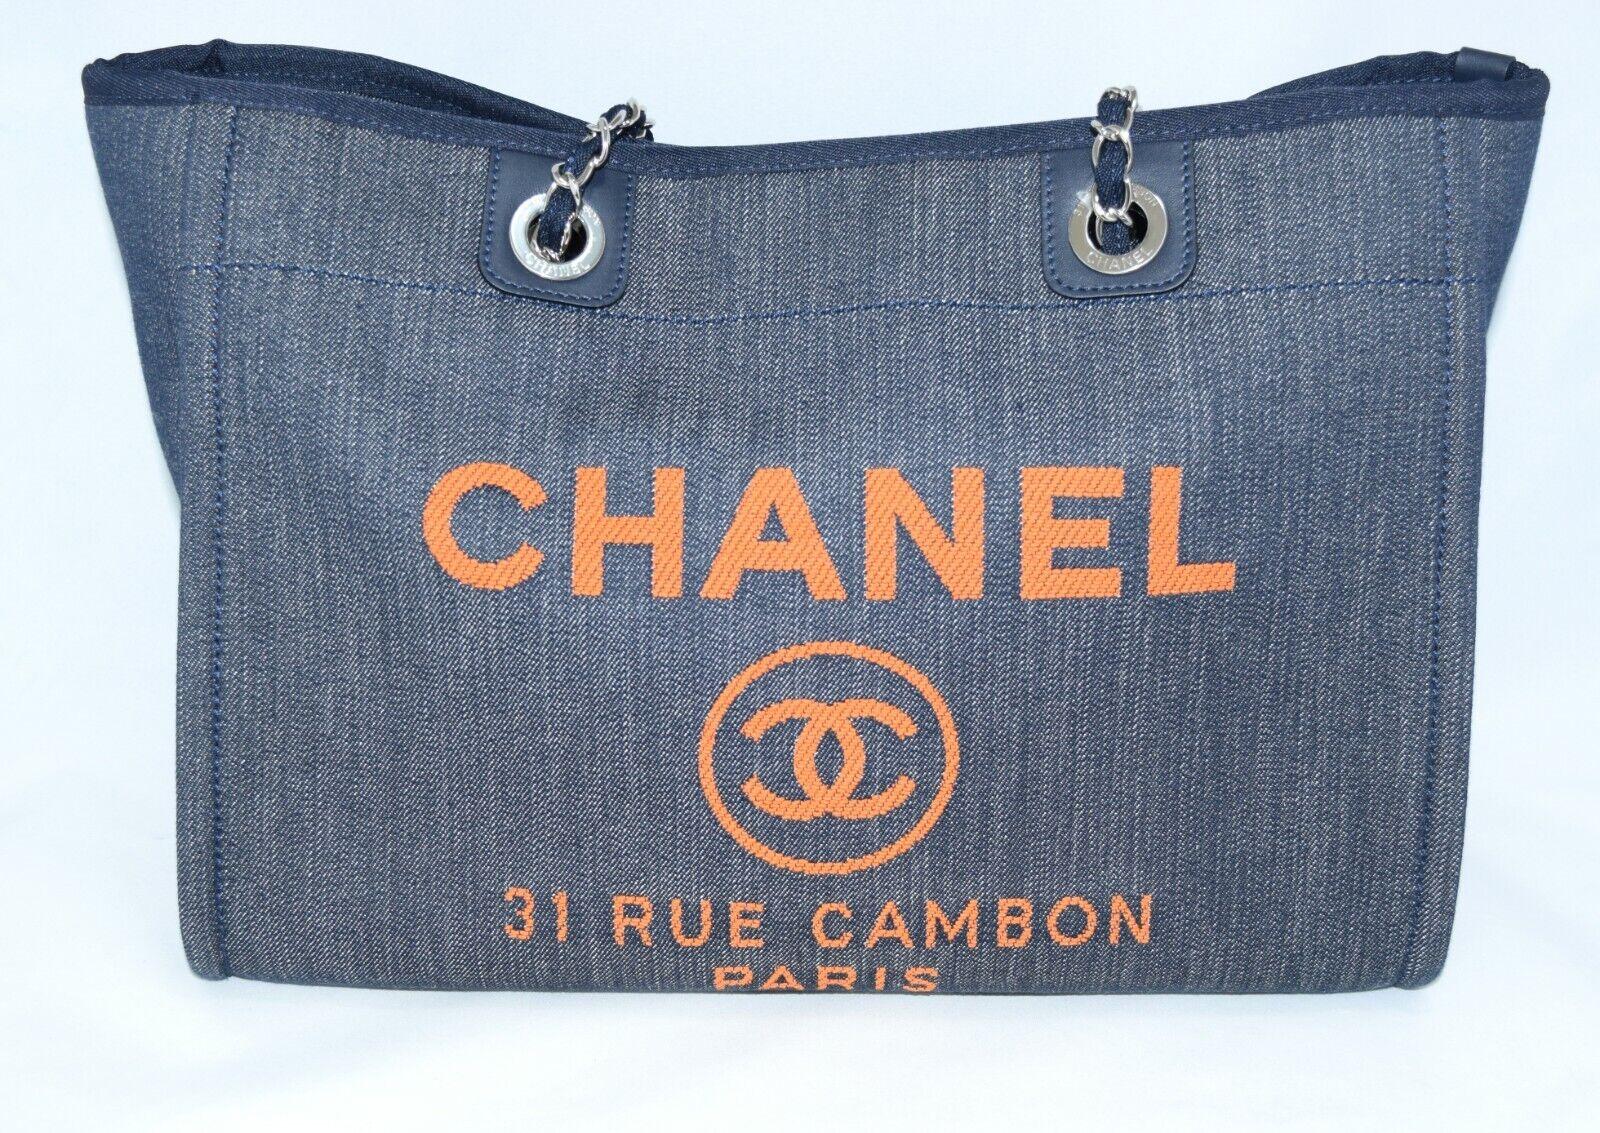 Chanel deauville sac bandoulière bleu denim chaîne sac à main neuf r19